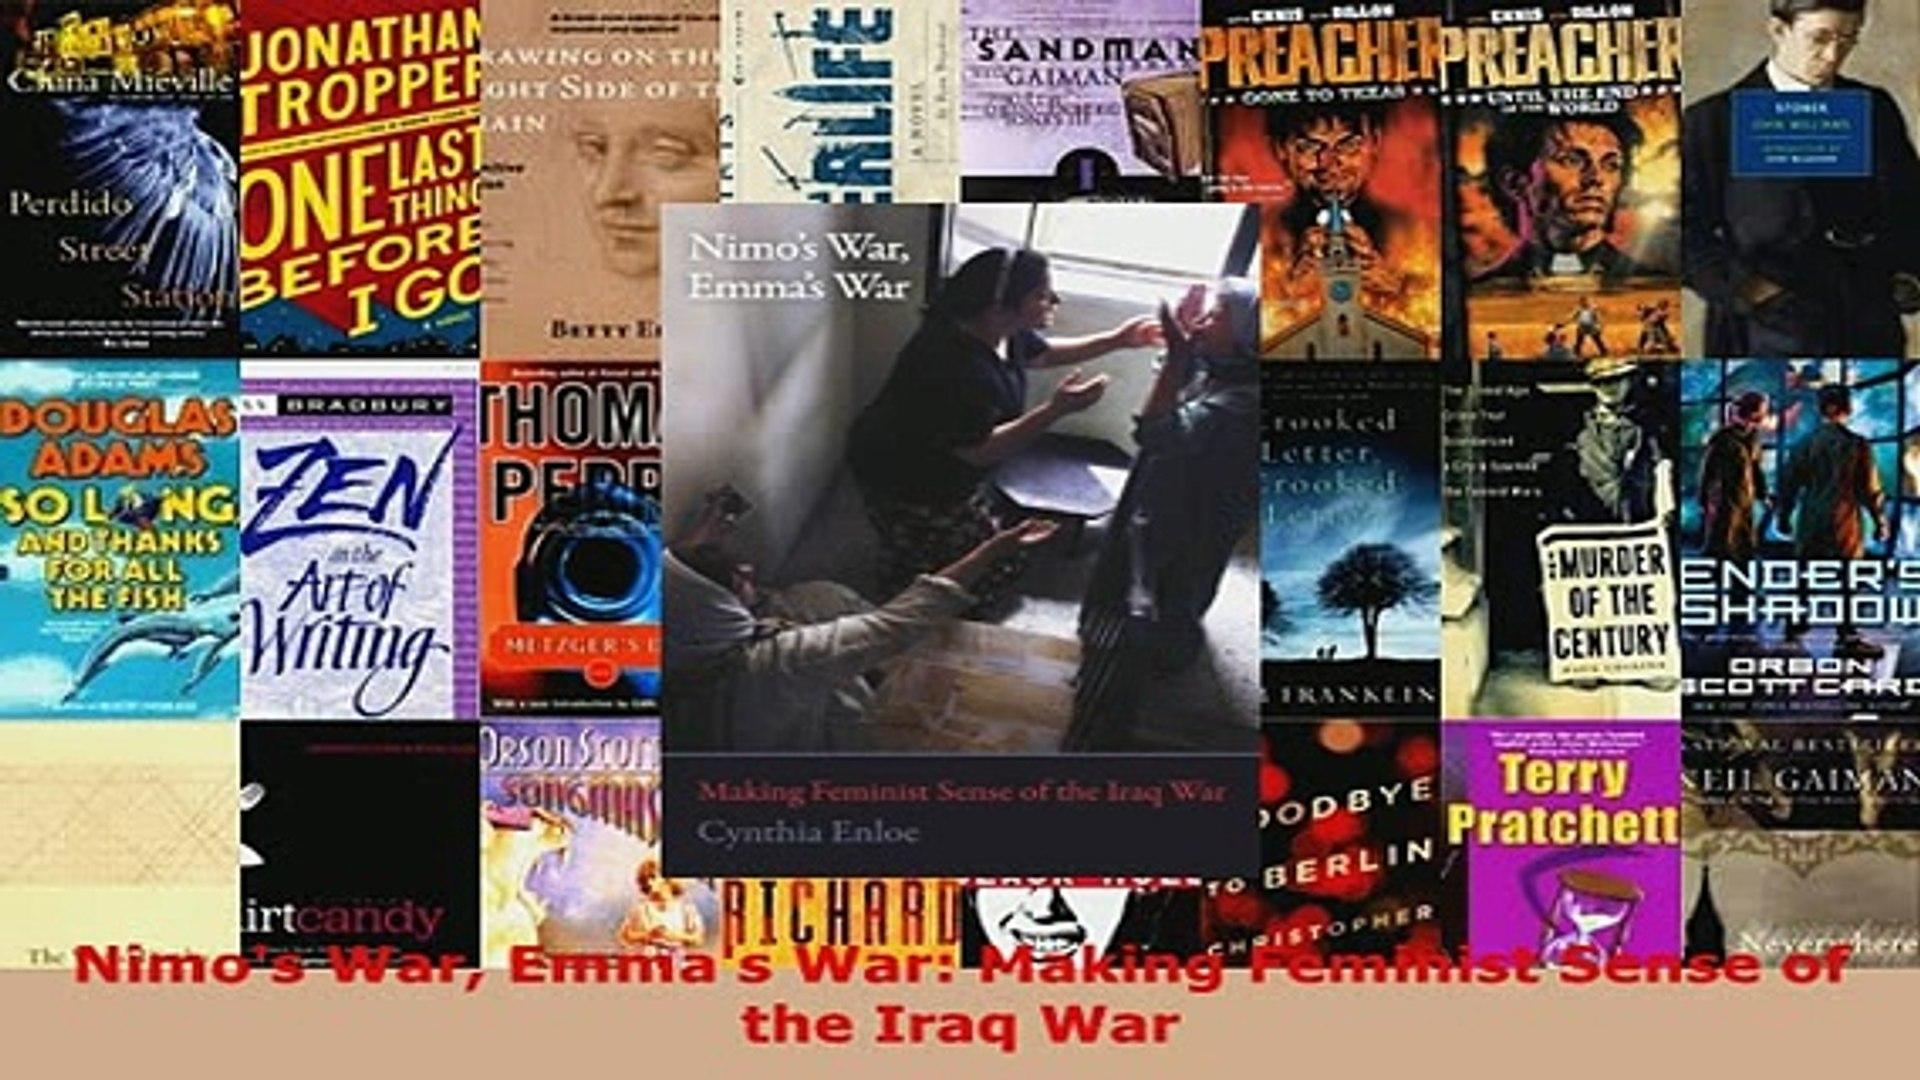 PDF  Nimos War Emmas War Making Feminist Sense of the Iraq War Download Online